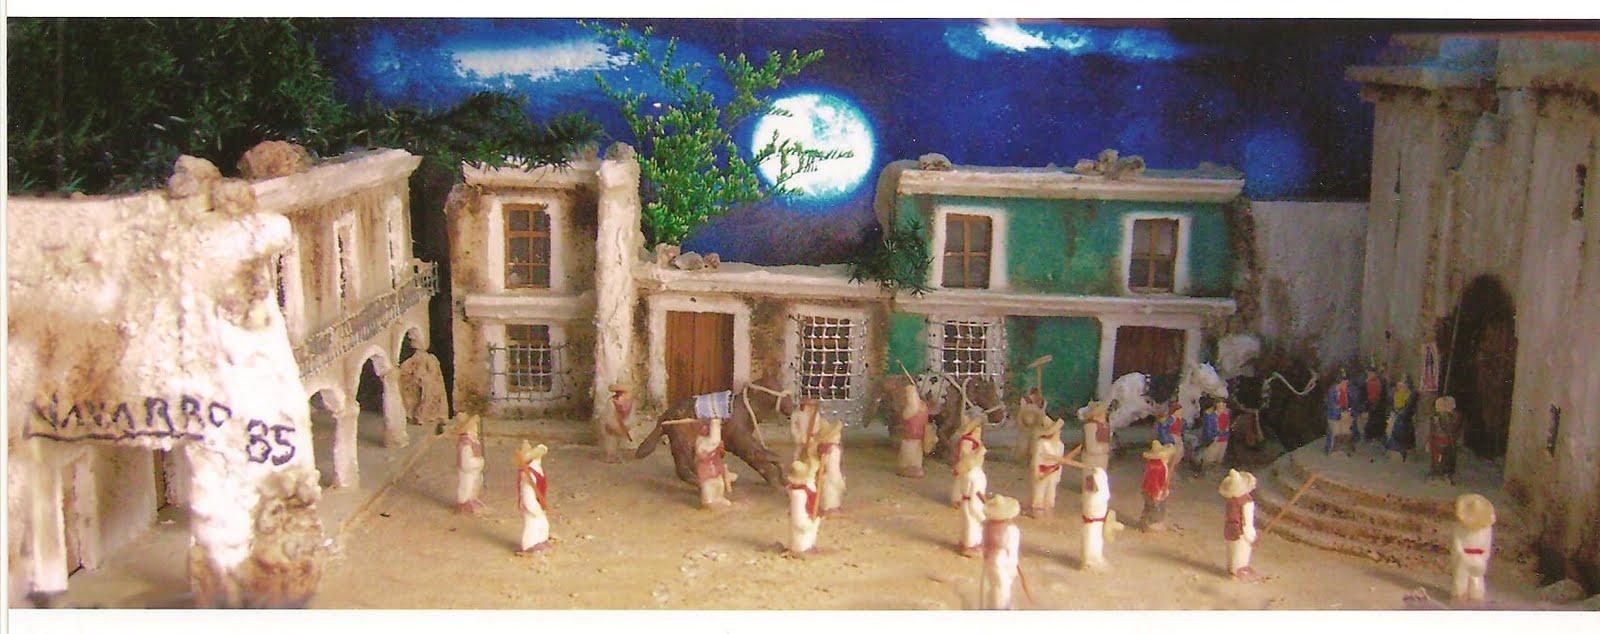 Museo de Miniaturas